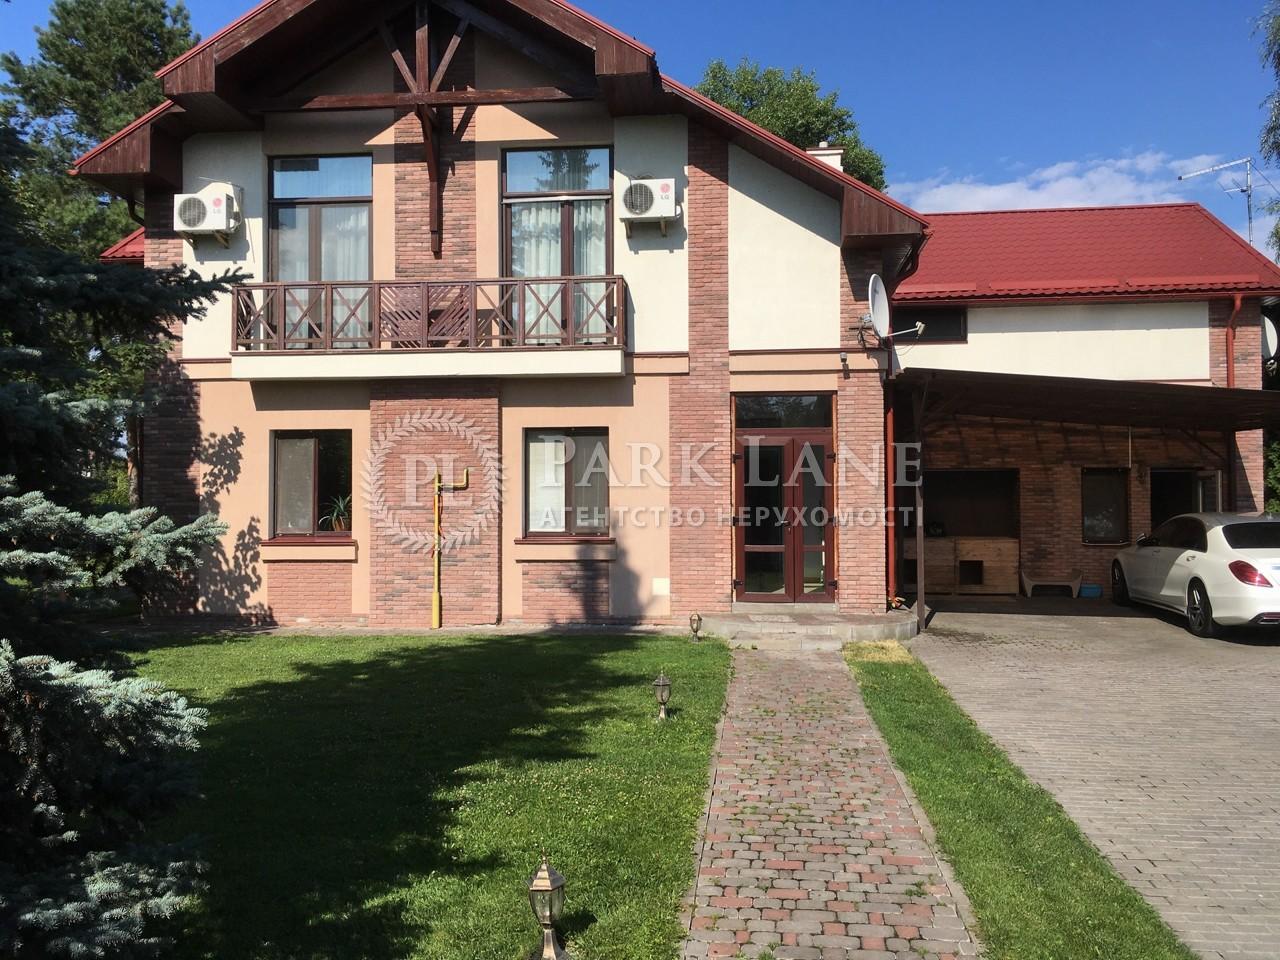 Будинок вул. Старокиївська, Козин (Конча-Заспа), B-100997 - Фото 1